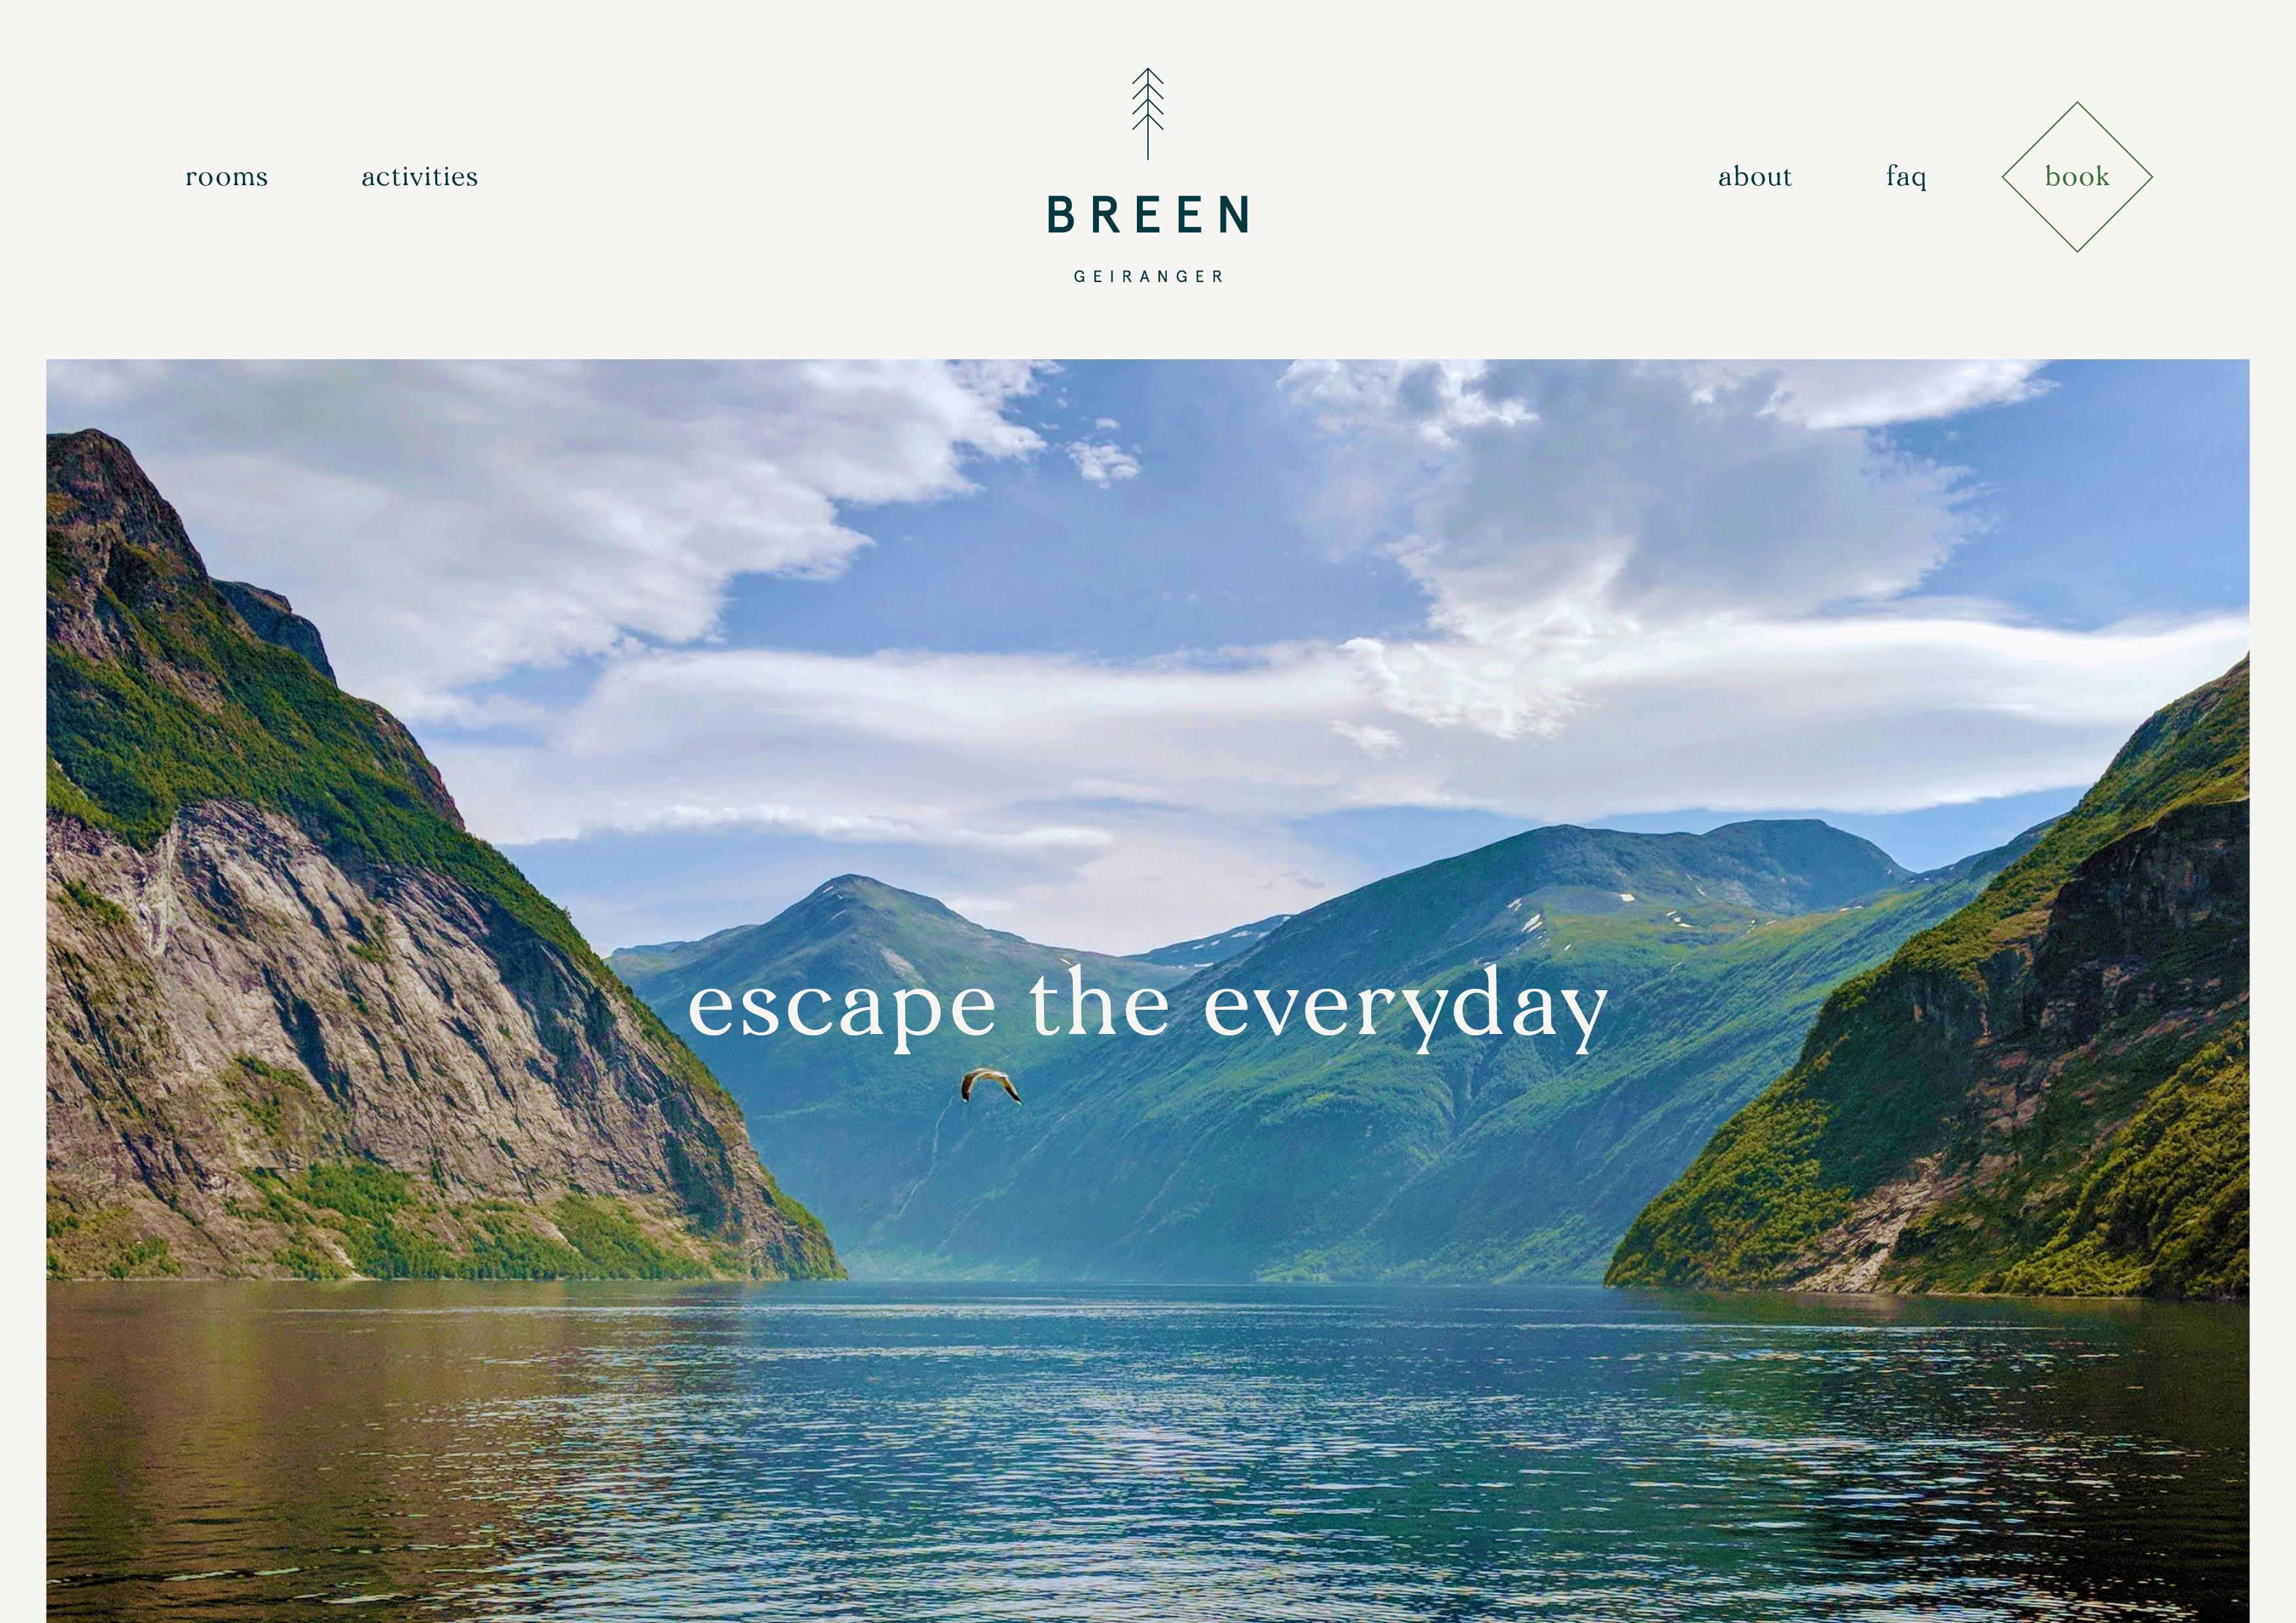 Website design by Jack Watkins, for Geirangerfjord hotel, BREEN